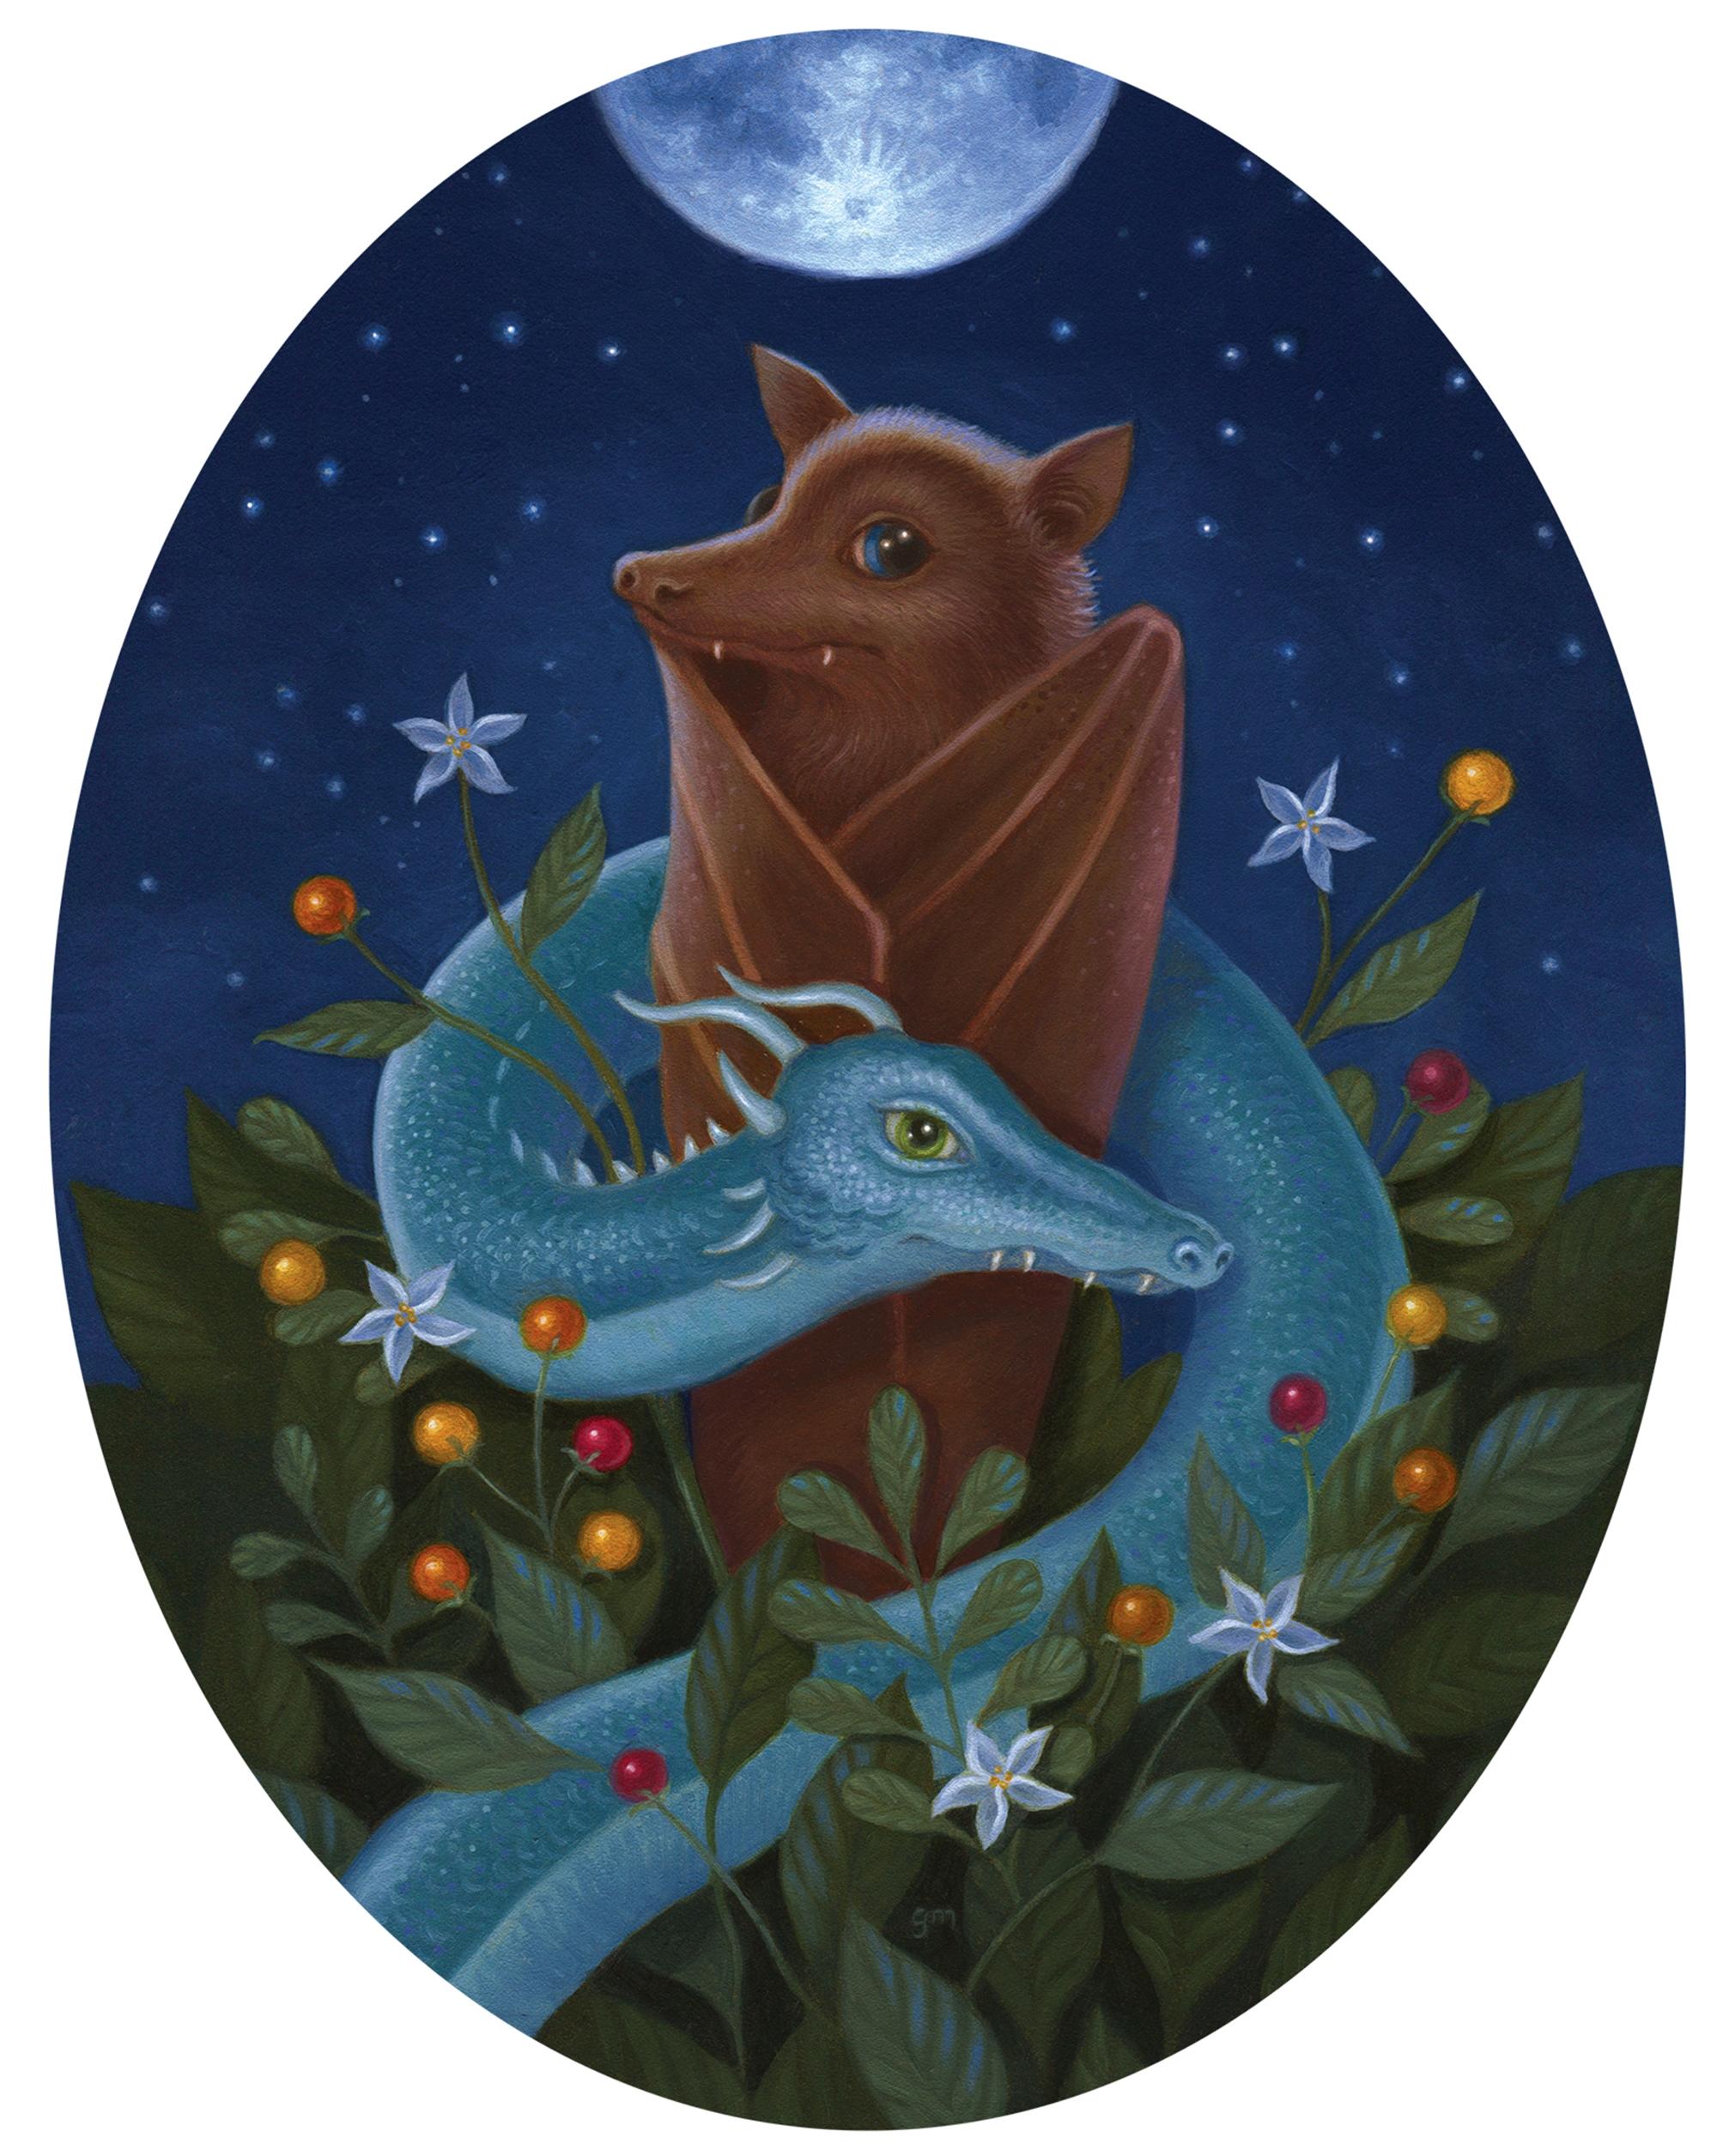 Toothy Twosome by Gina Matarazzo